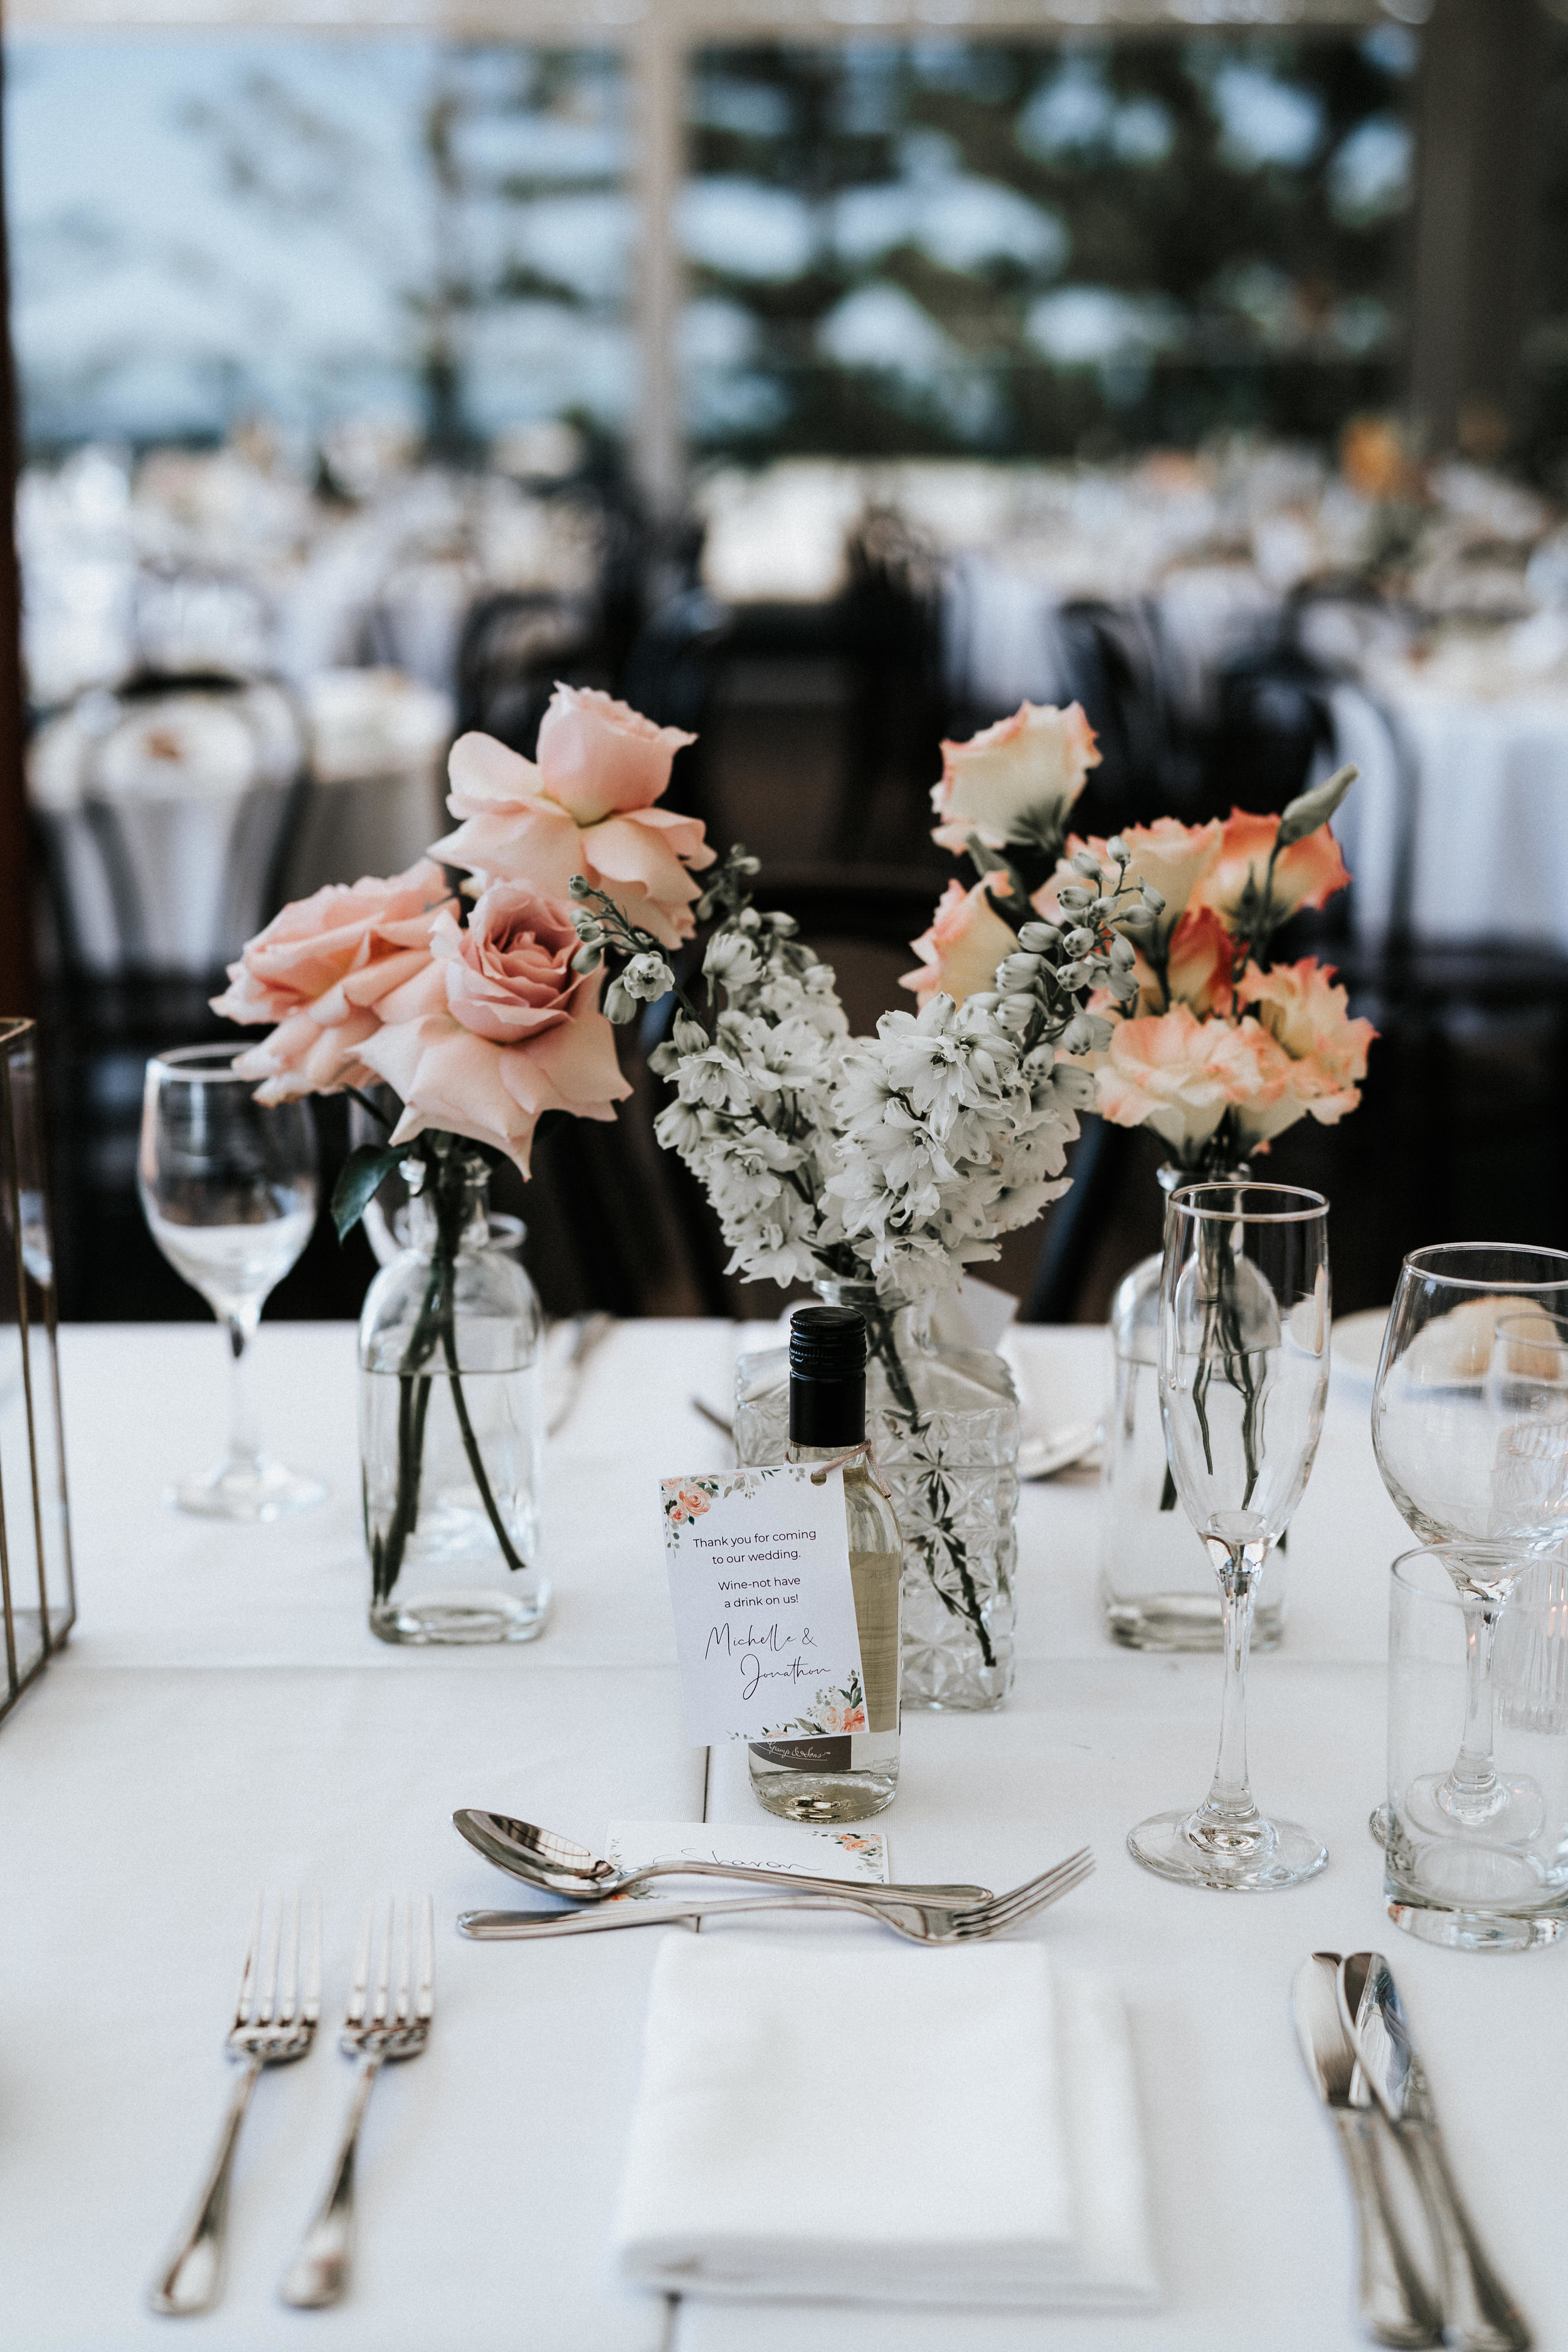 michelle-jonathon-harley-wedding-723.jpg